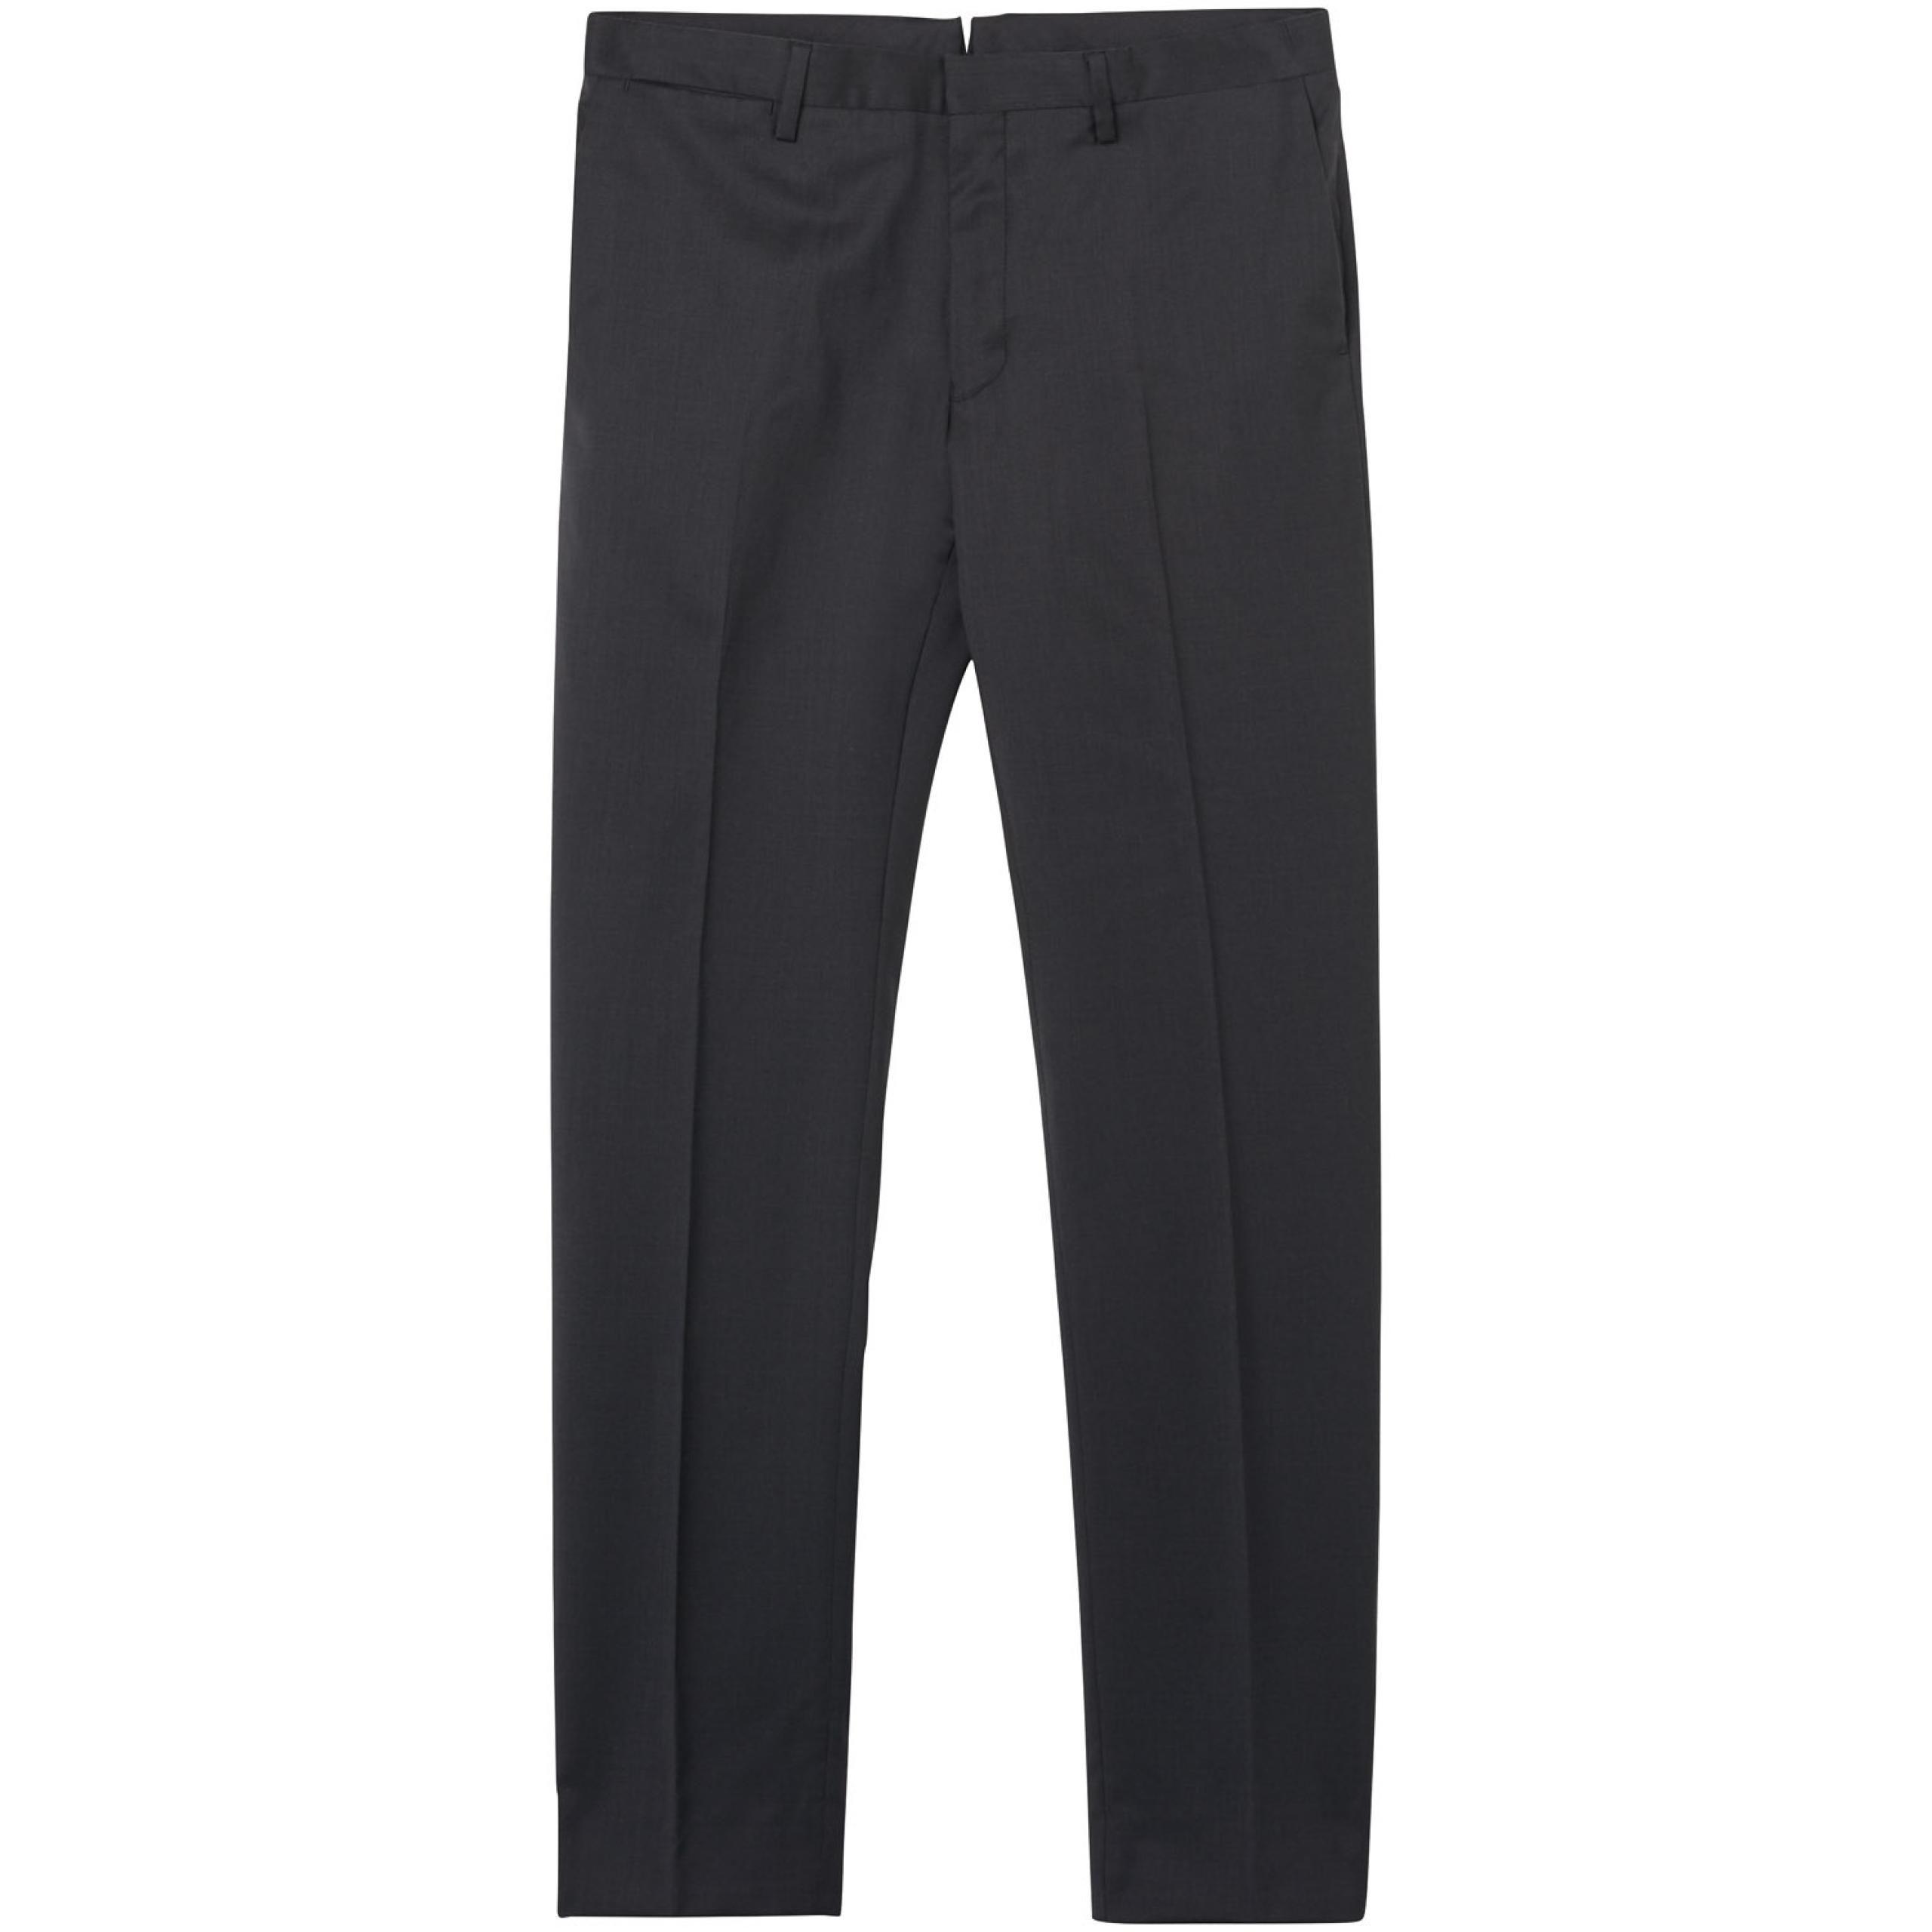 GANT Slim Fit Cool Traveler Trousers - Black GANT xmlU0VyCS